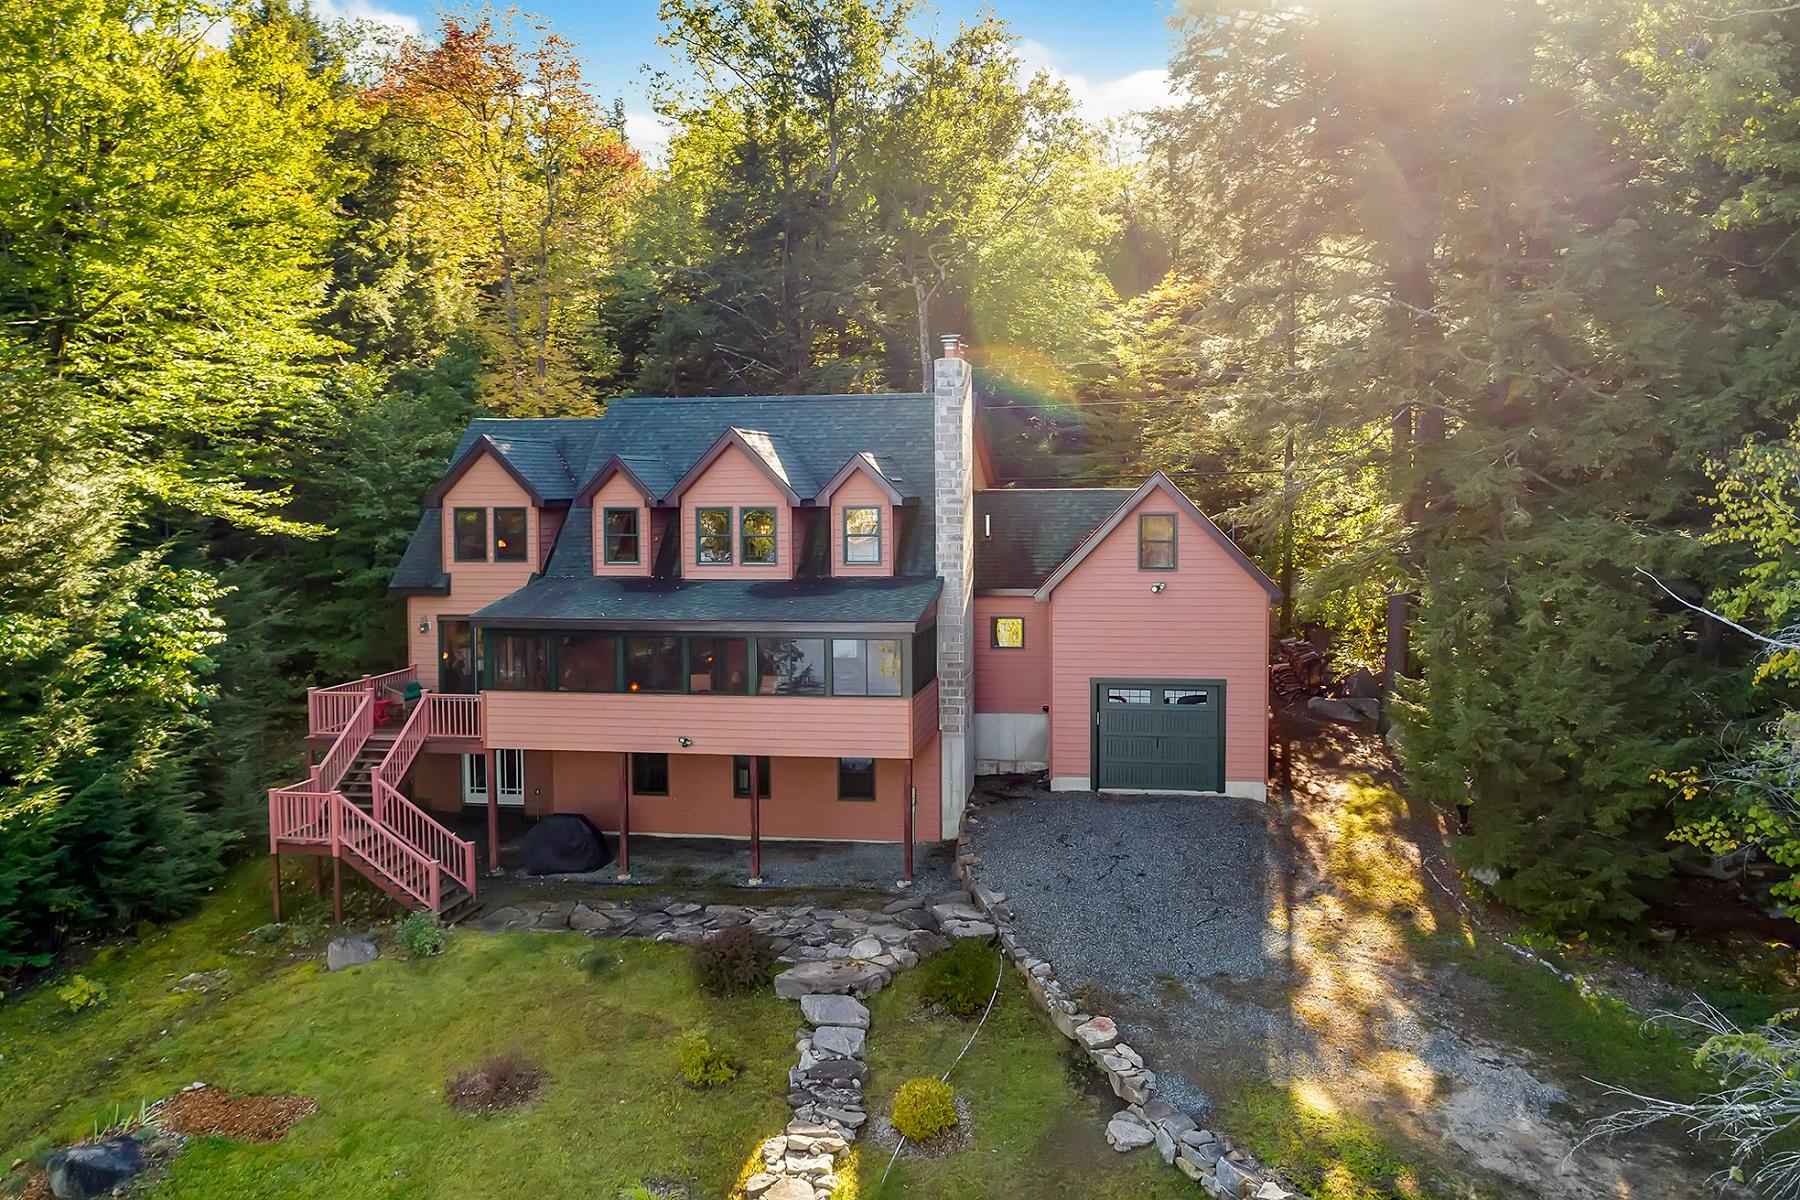 Single Family Homes for Sale at Custom Lake Winnipesaukee Home 48 Frye Road Moultonborough, New Hampshire 03254 United States